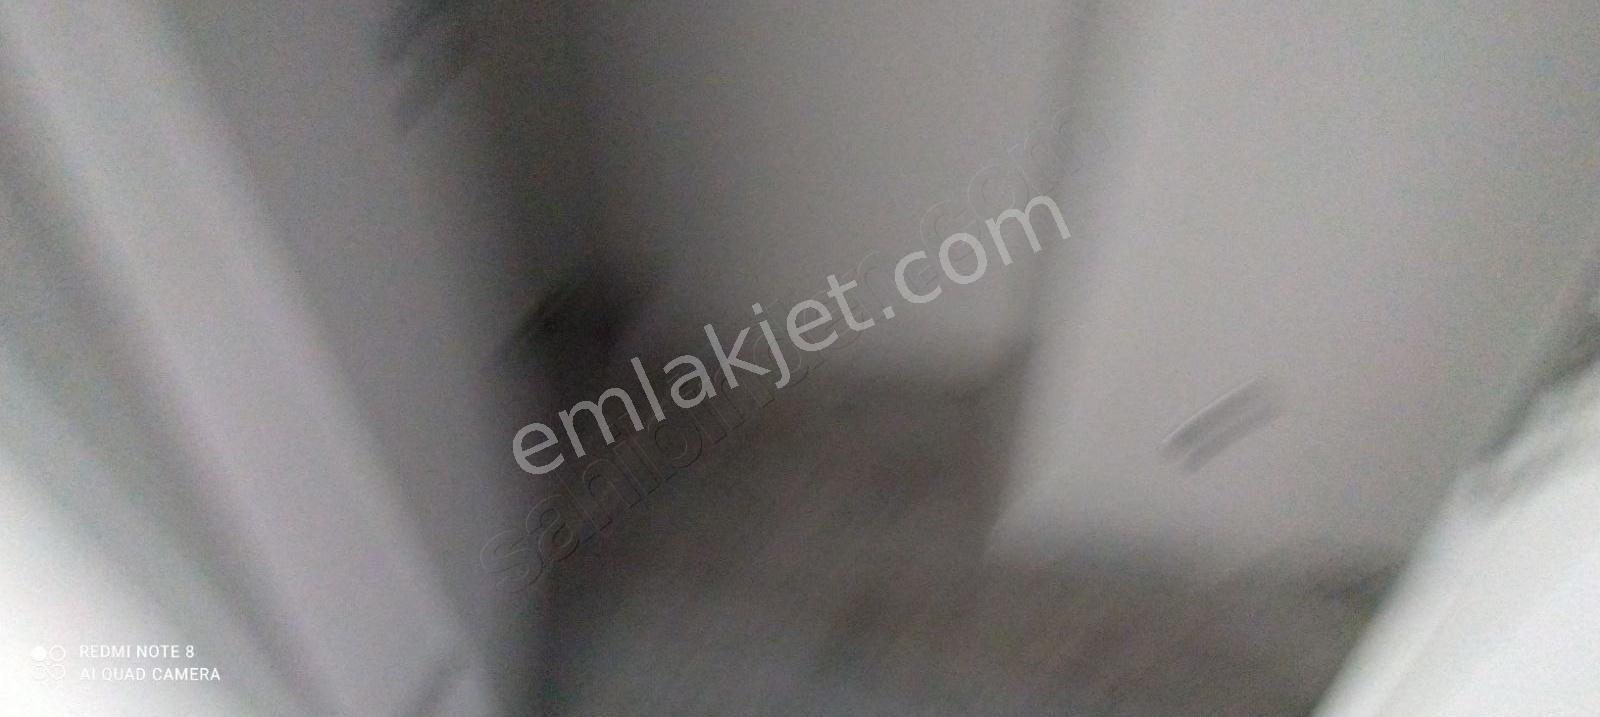 https://imaj.emlakjet.com/listing/9676482/F3CCFB39B0CB0B0A6543E1FCBD15EB0D9676482.jpg